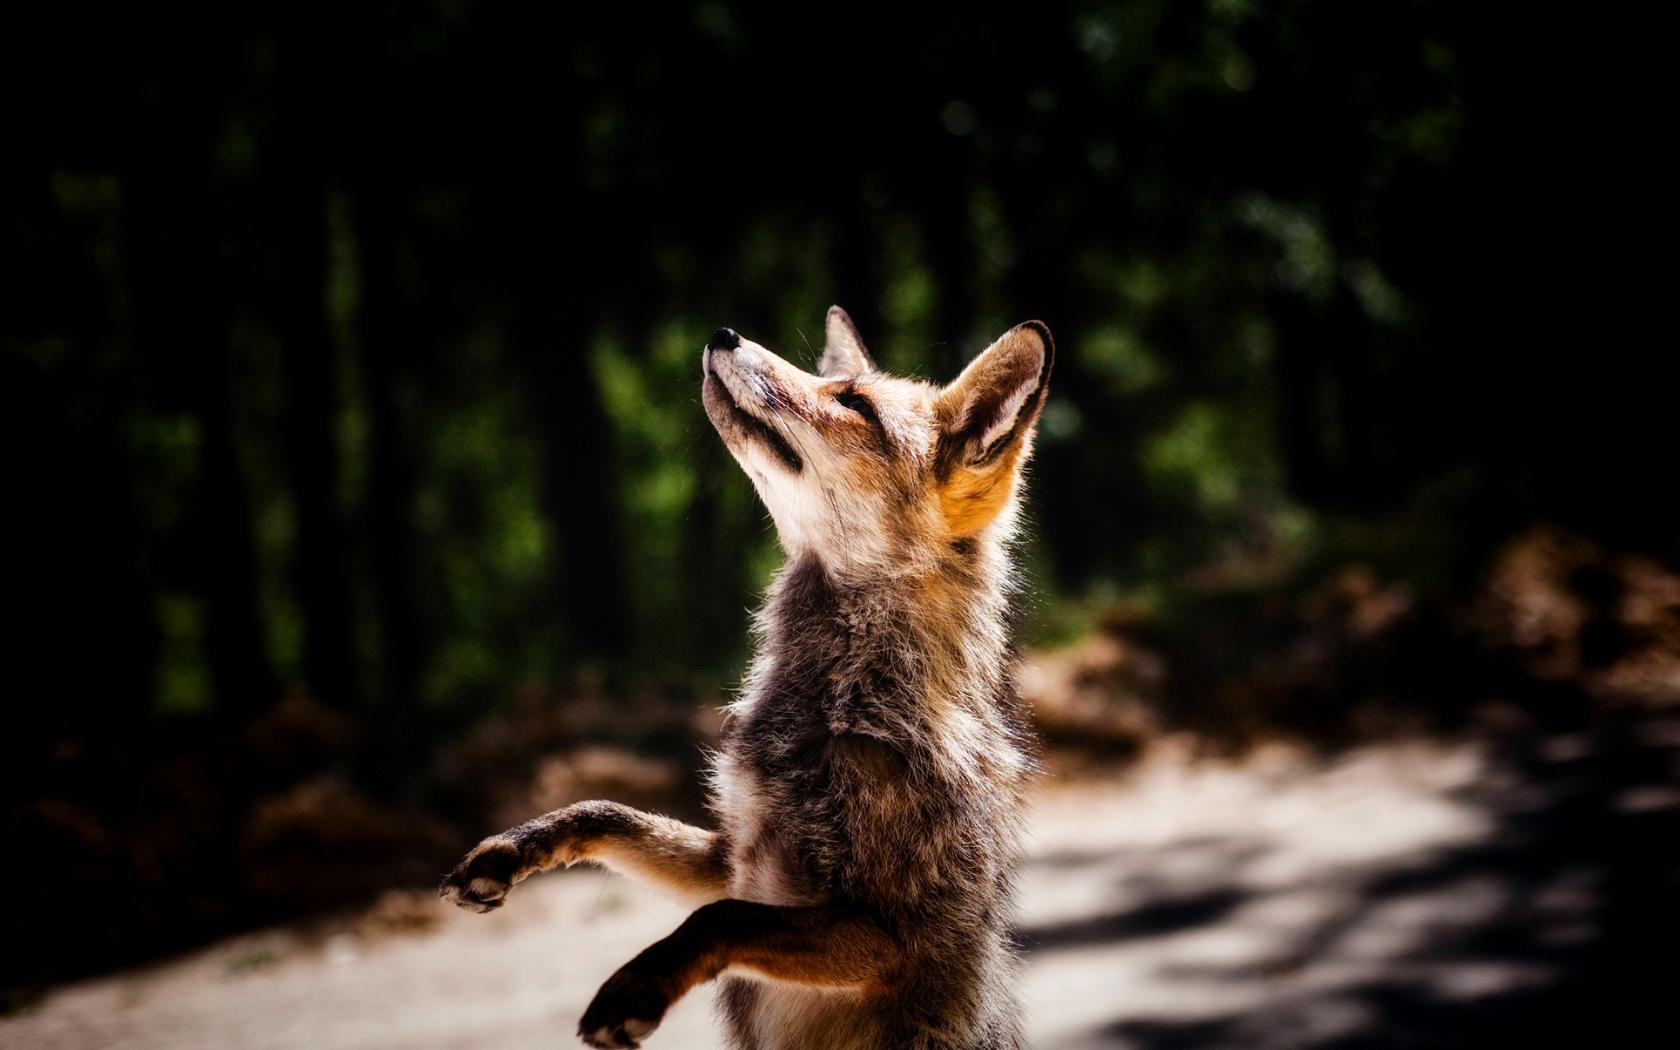 1680x1050 wallpaper Jump, fox, wildlife, animal